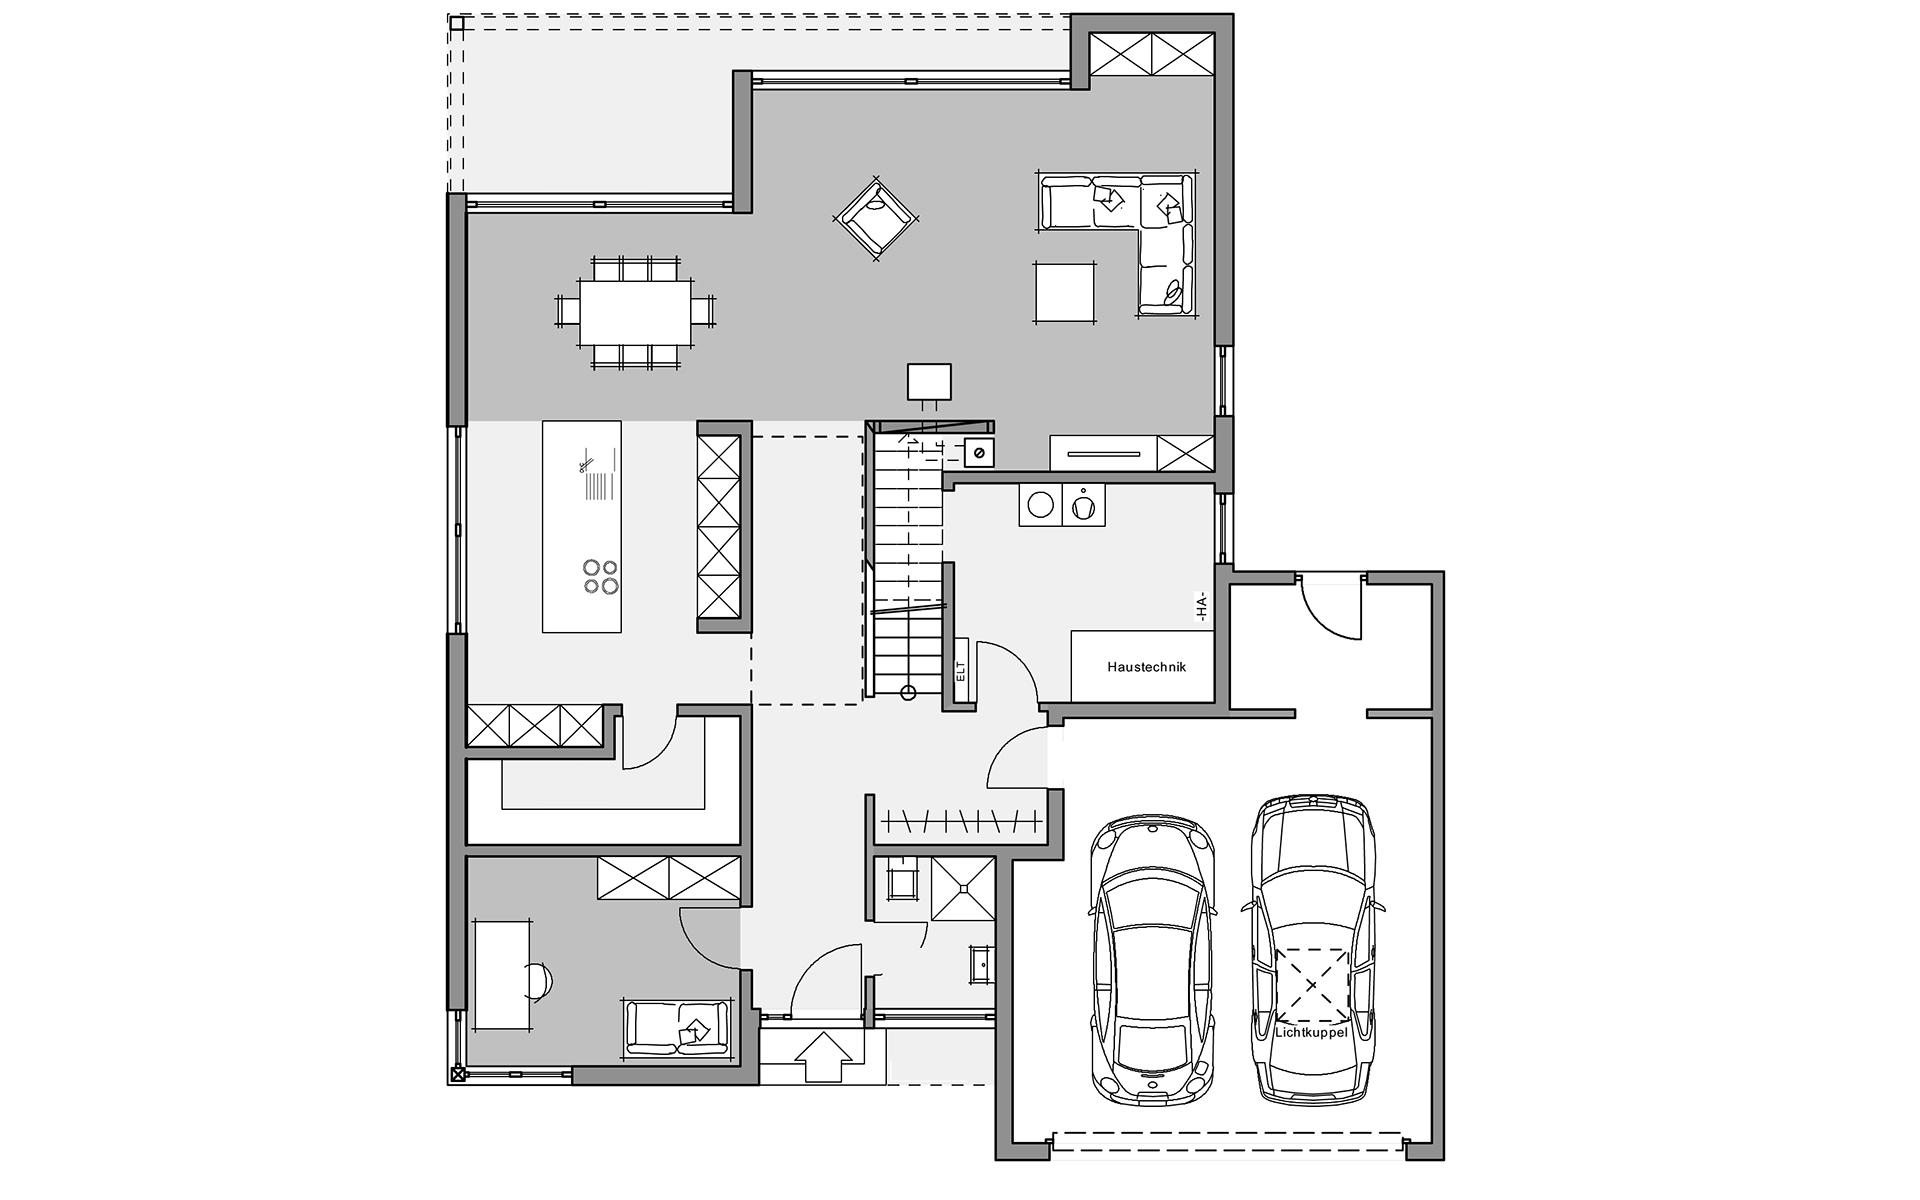 Erdgeschoss Bauhaus-Villa von Meisterstück-HAUS